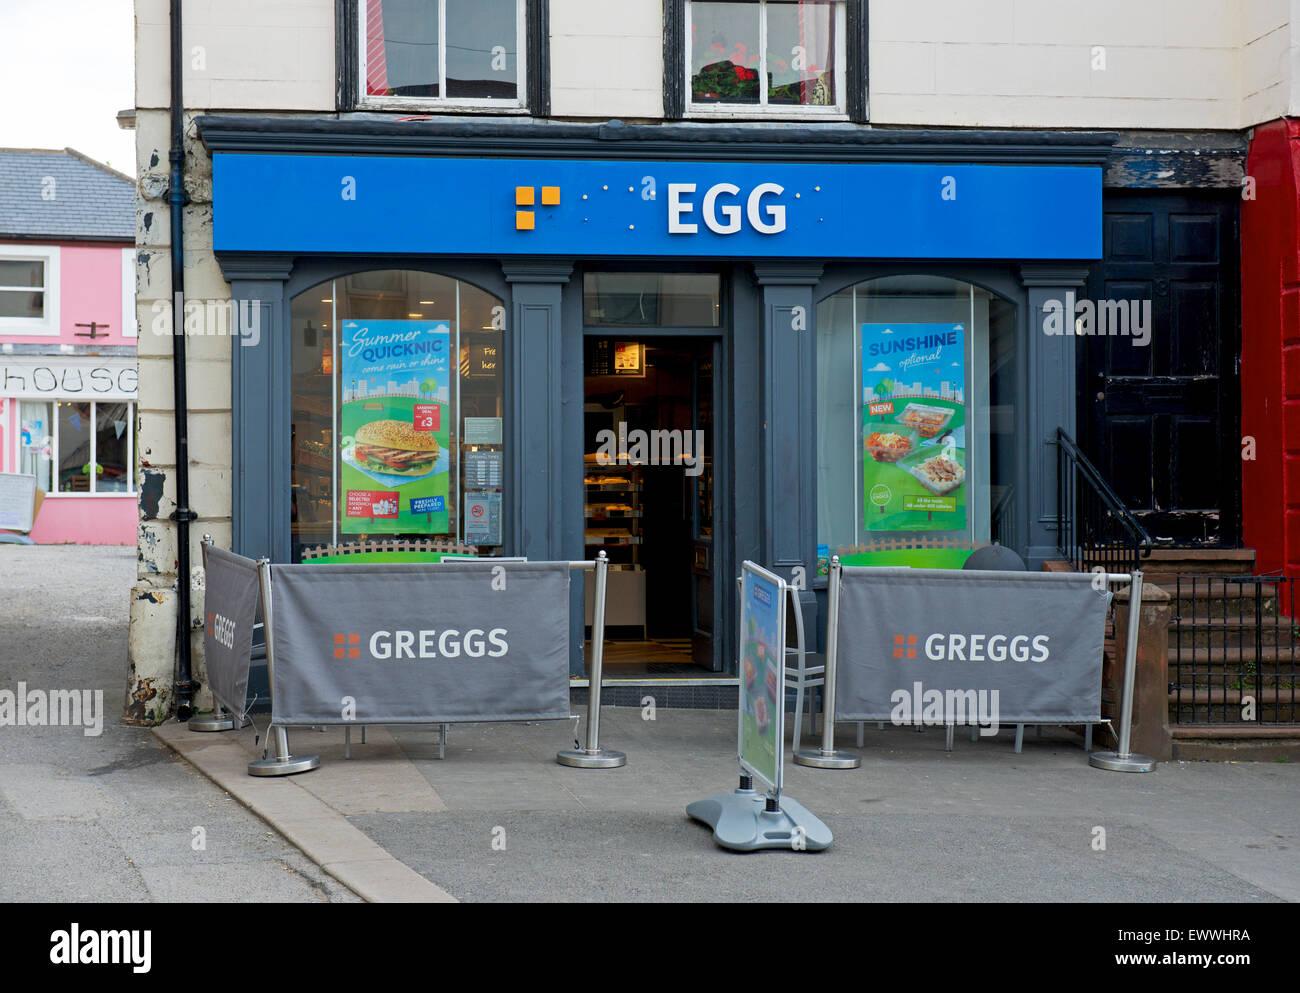 Imaginative vandalism of branch of Greggs the bakers, England UK - Stock Image